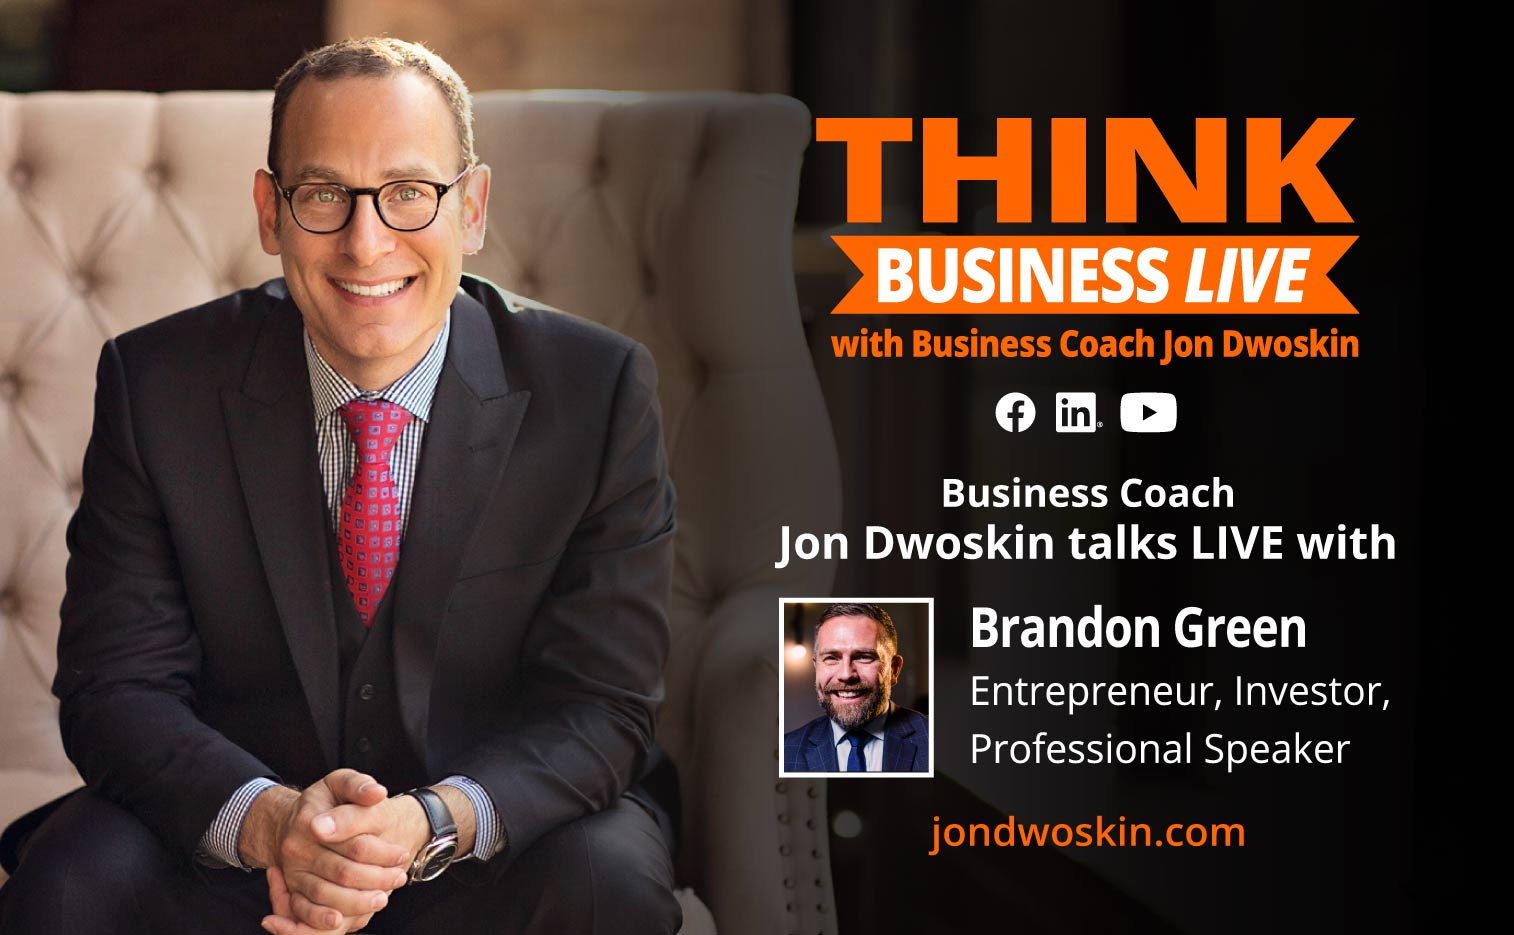 THINK Business LIVE: Jon Dwoskin Talks with Brandon Green